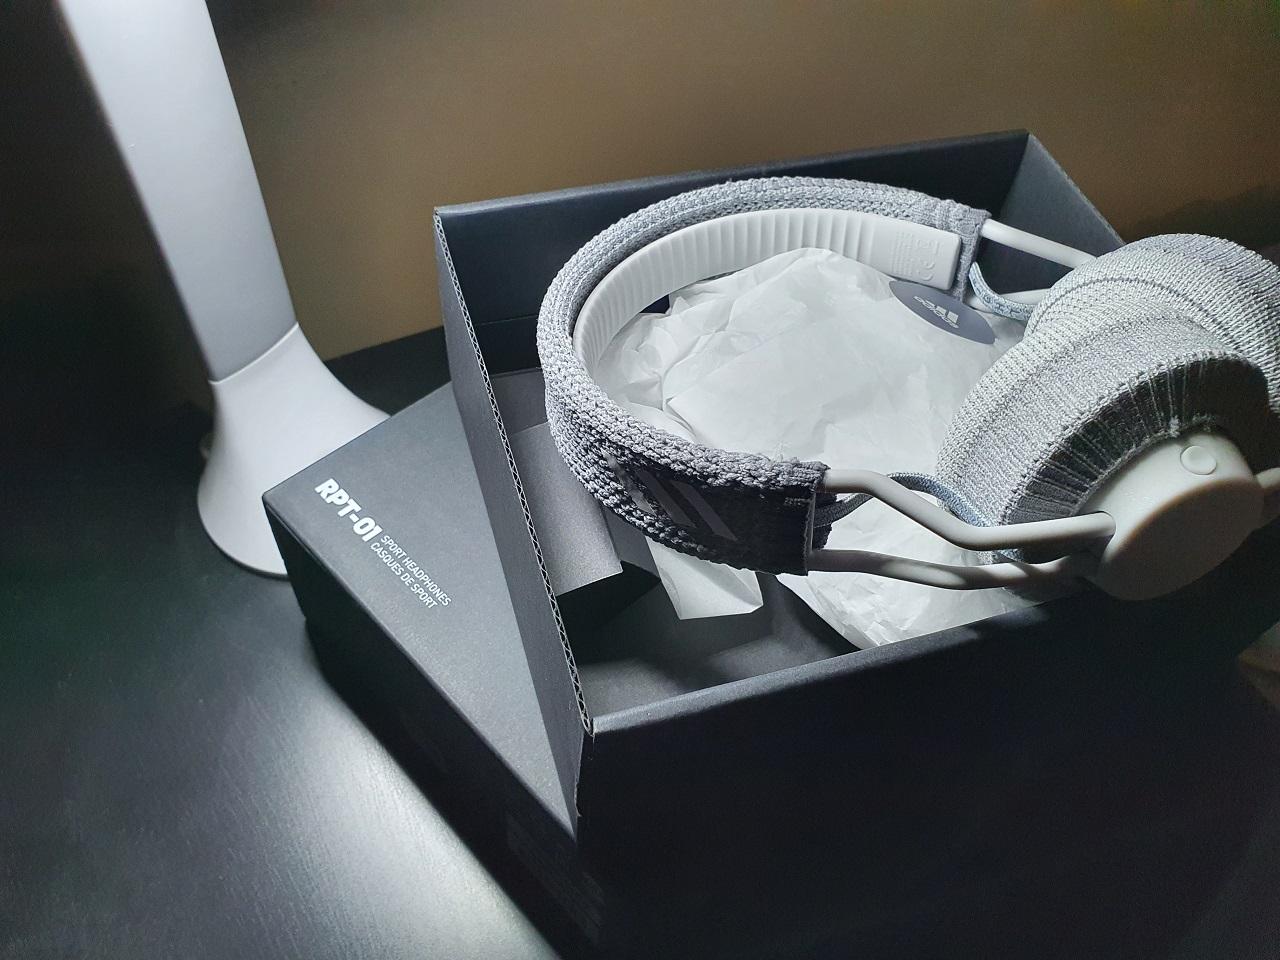 Adidas RPT 01 4